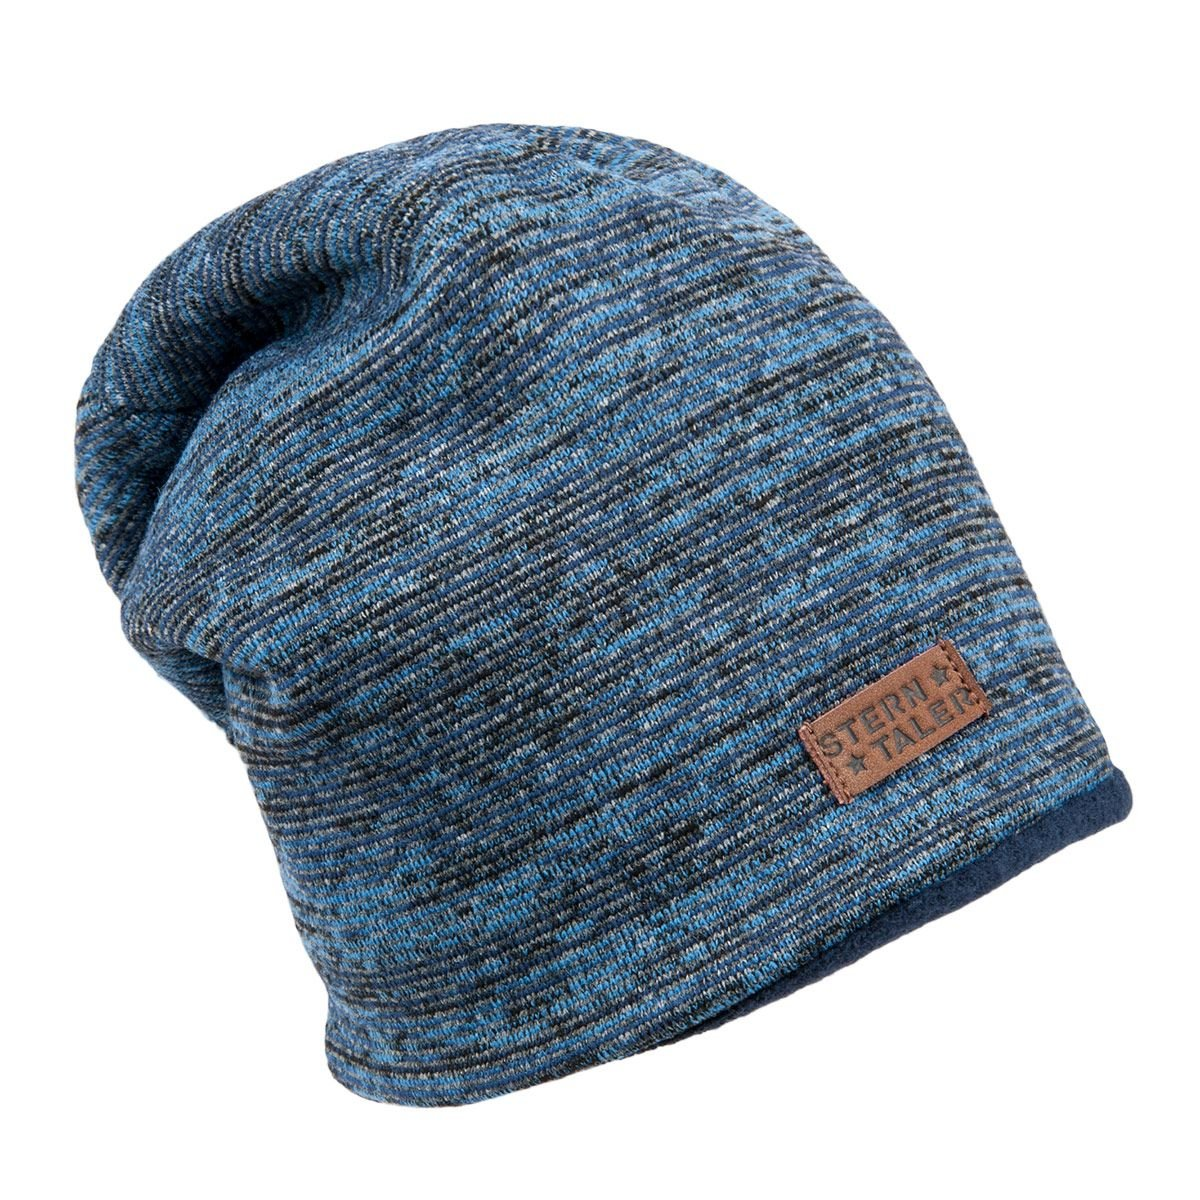 STERNTALER   Slouch Beanie cap, EUR 21,99 --  Online Hatshop for hats,  caps, headbands, gloves and scarfs e3a66e4fea1